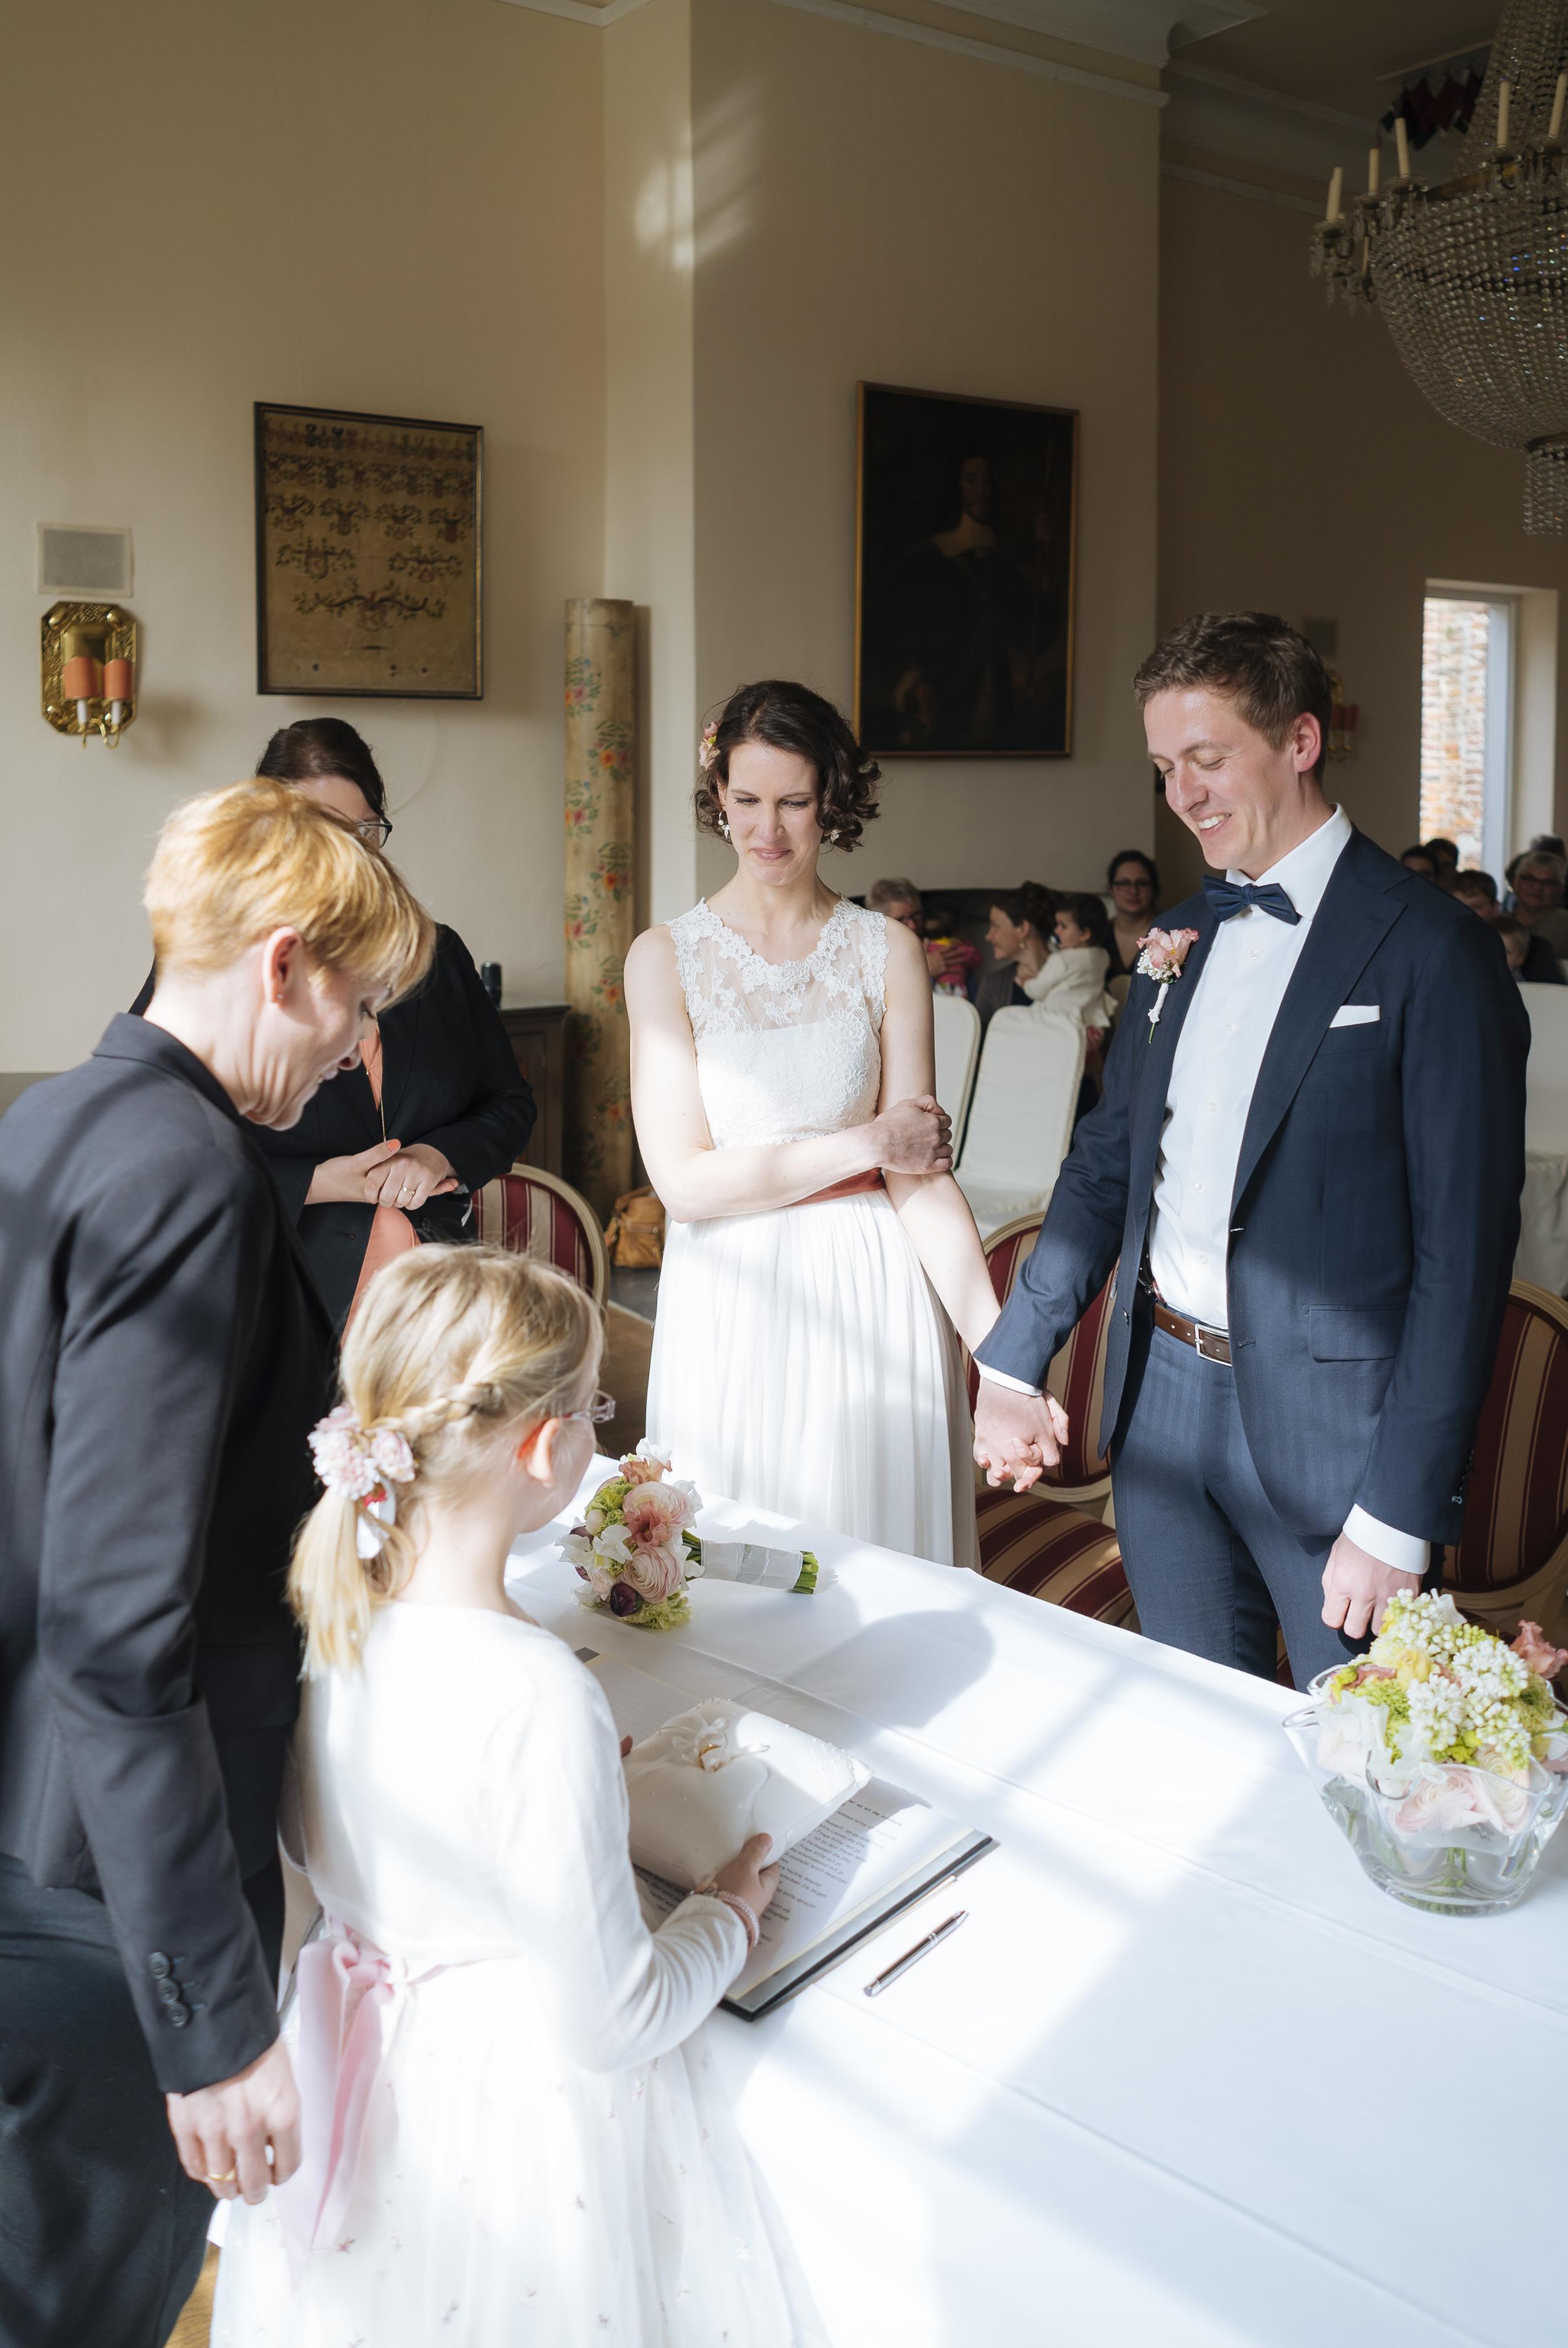 Hochzeitsfotograf-Schlossruine-Hertefeld-Weeze-076.jpg